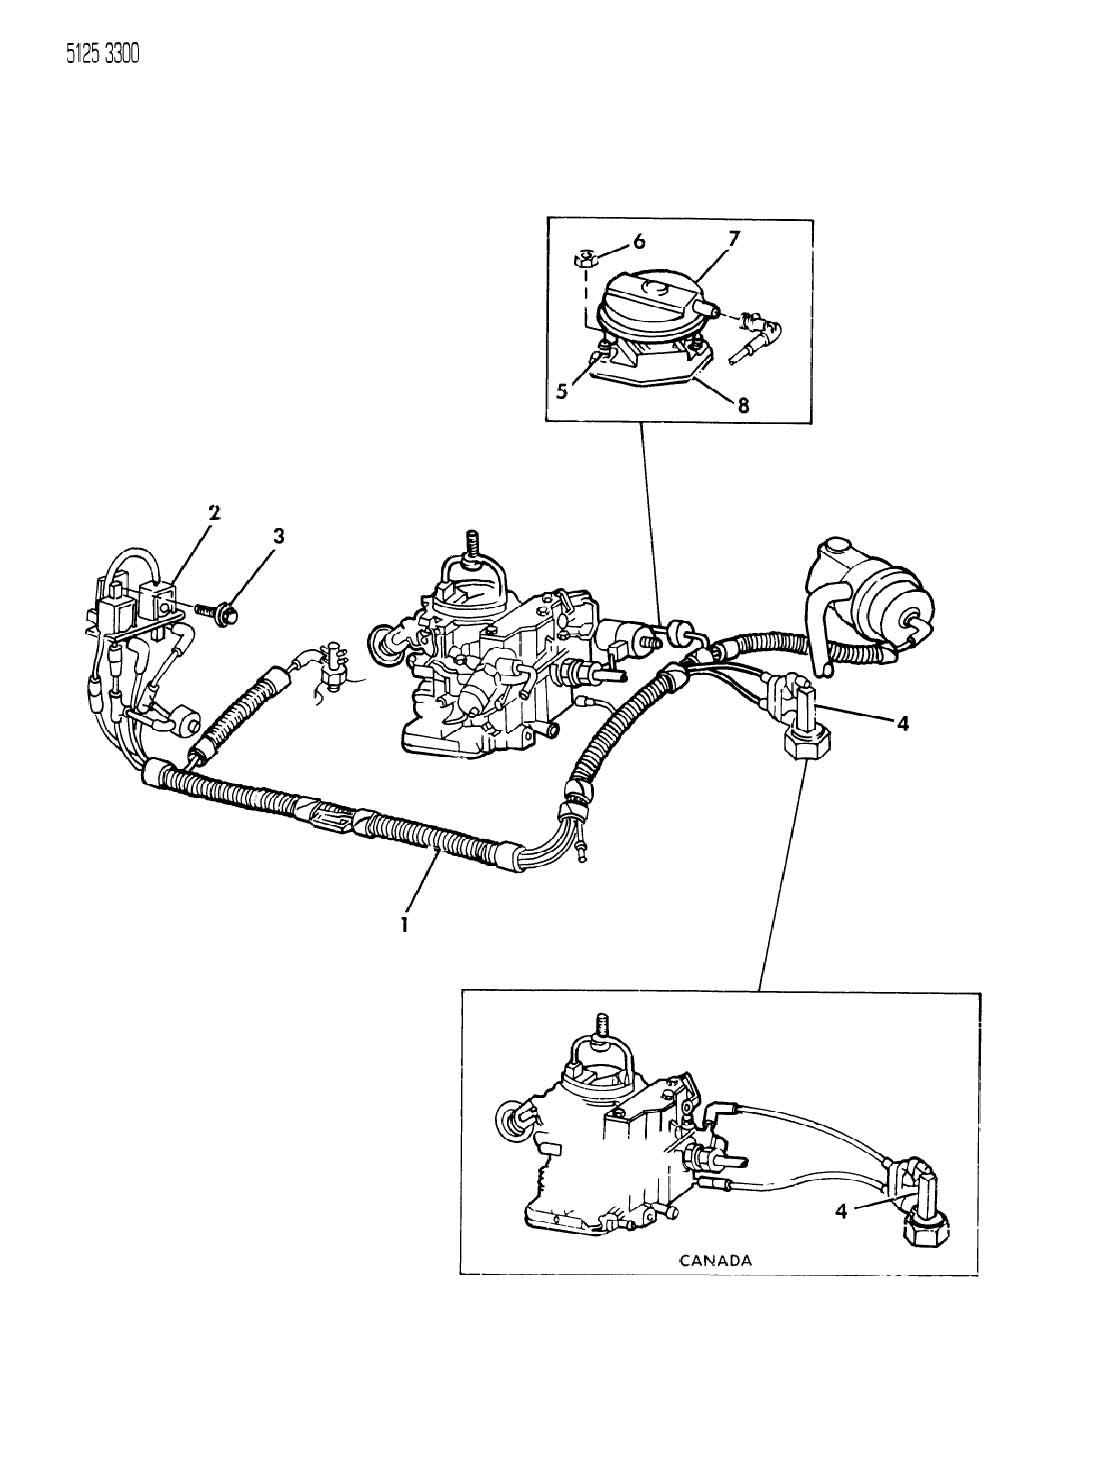 2001 Plymouth Prowler Screw  Self Piercing  25